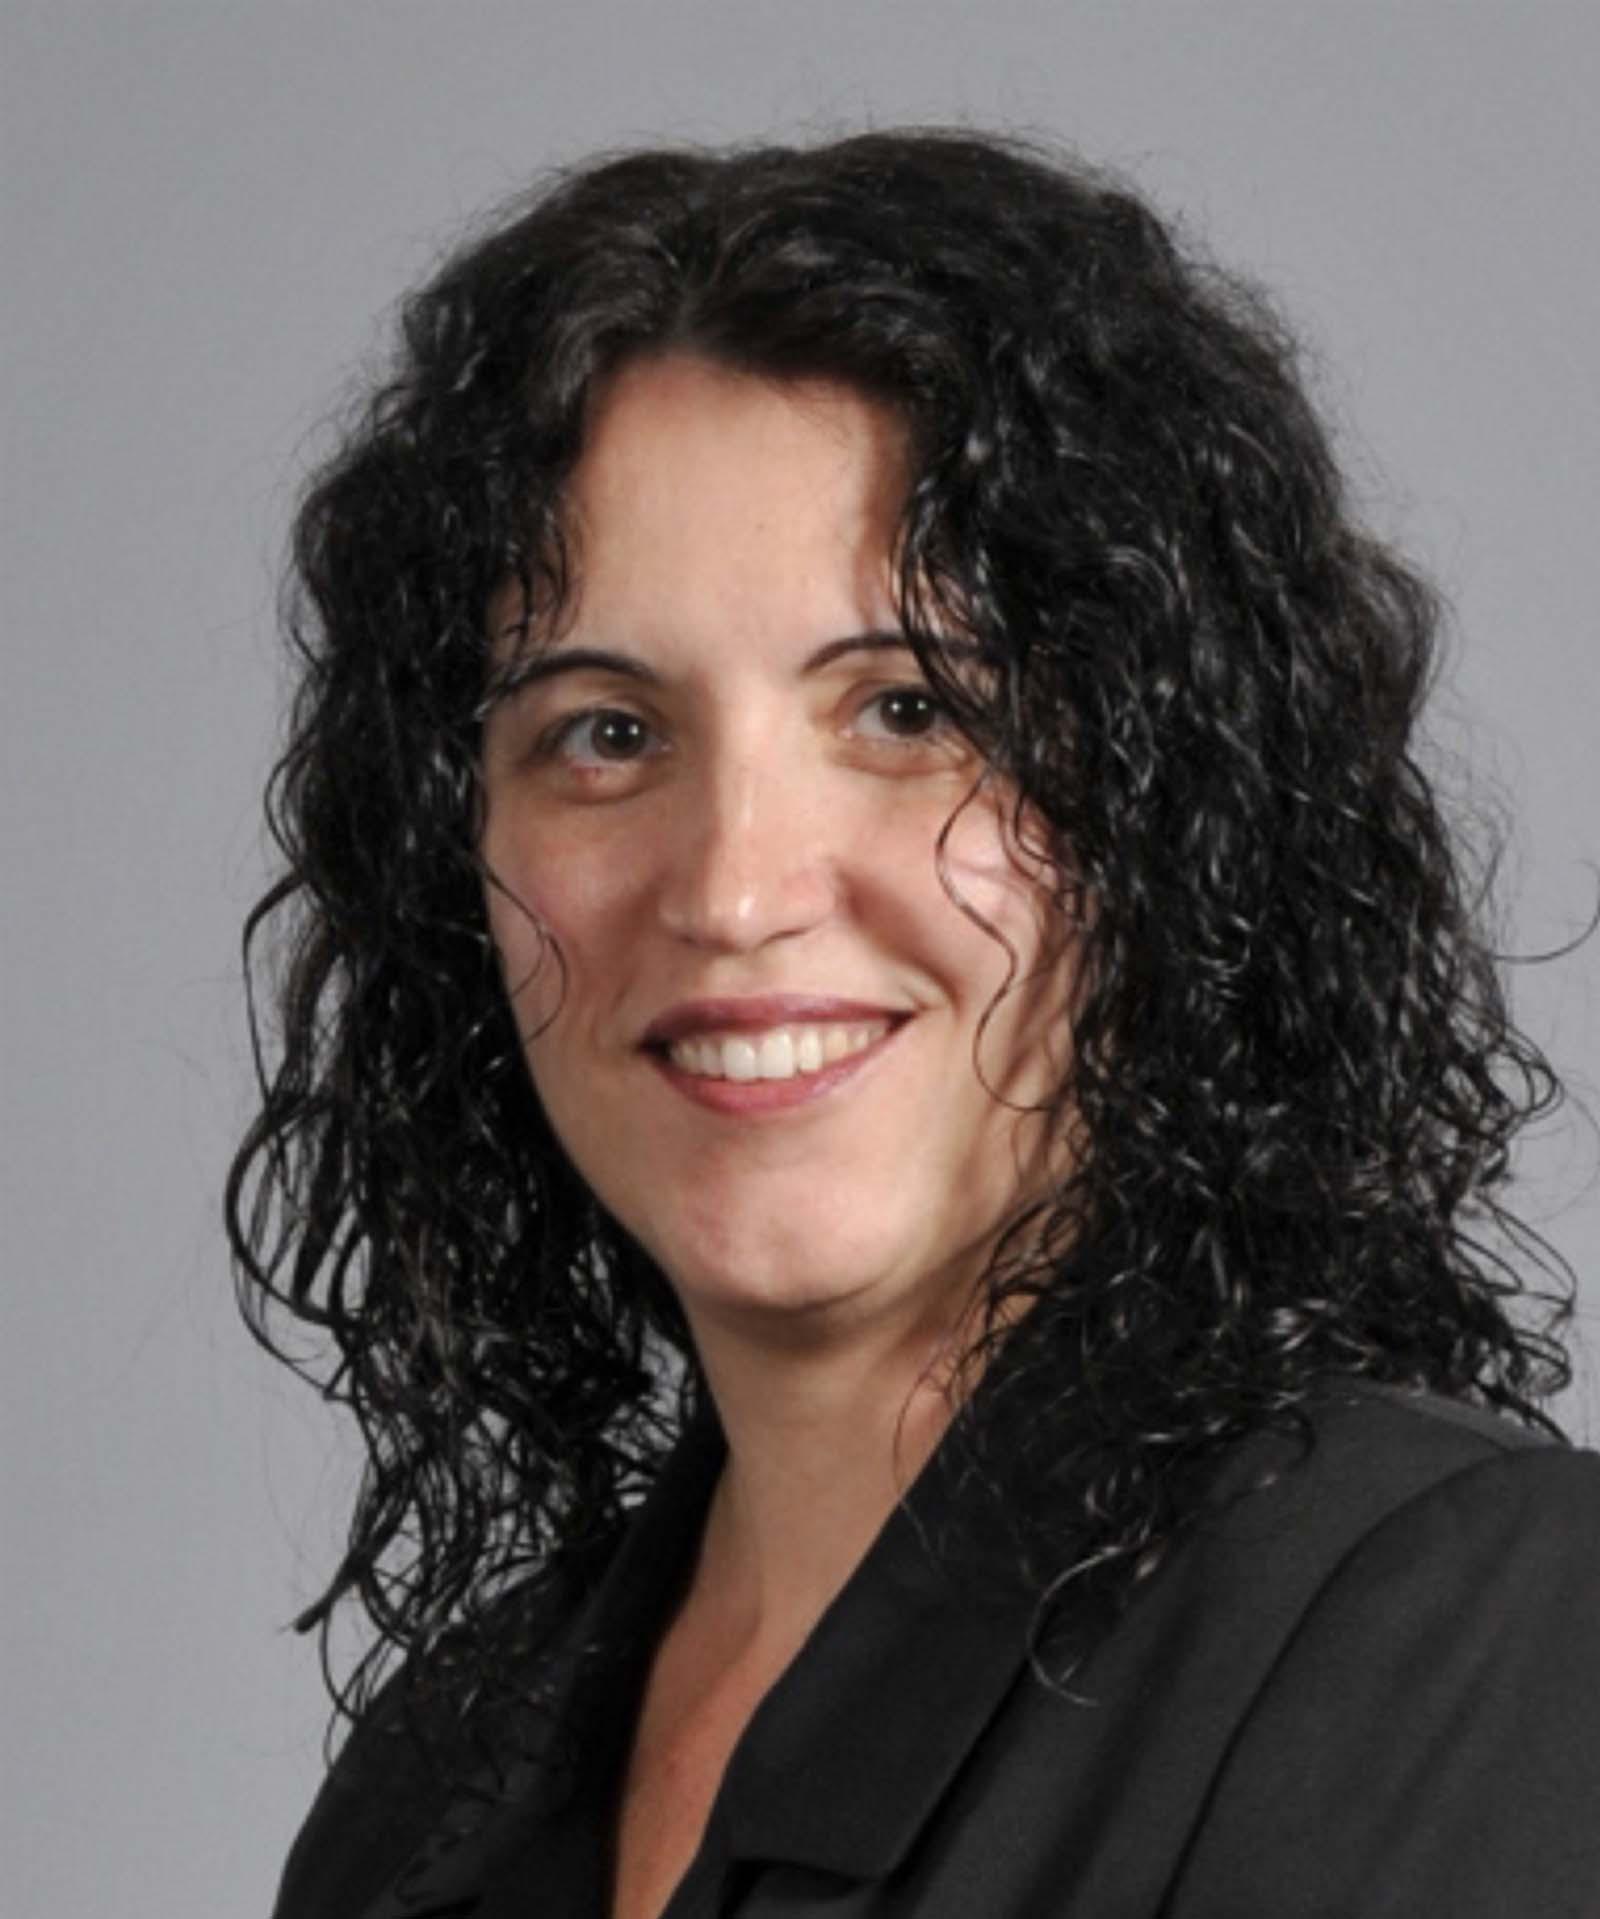 Simona Bonifacic, Associate